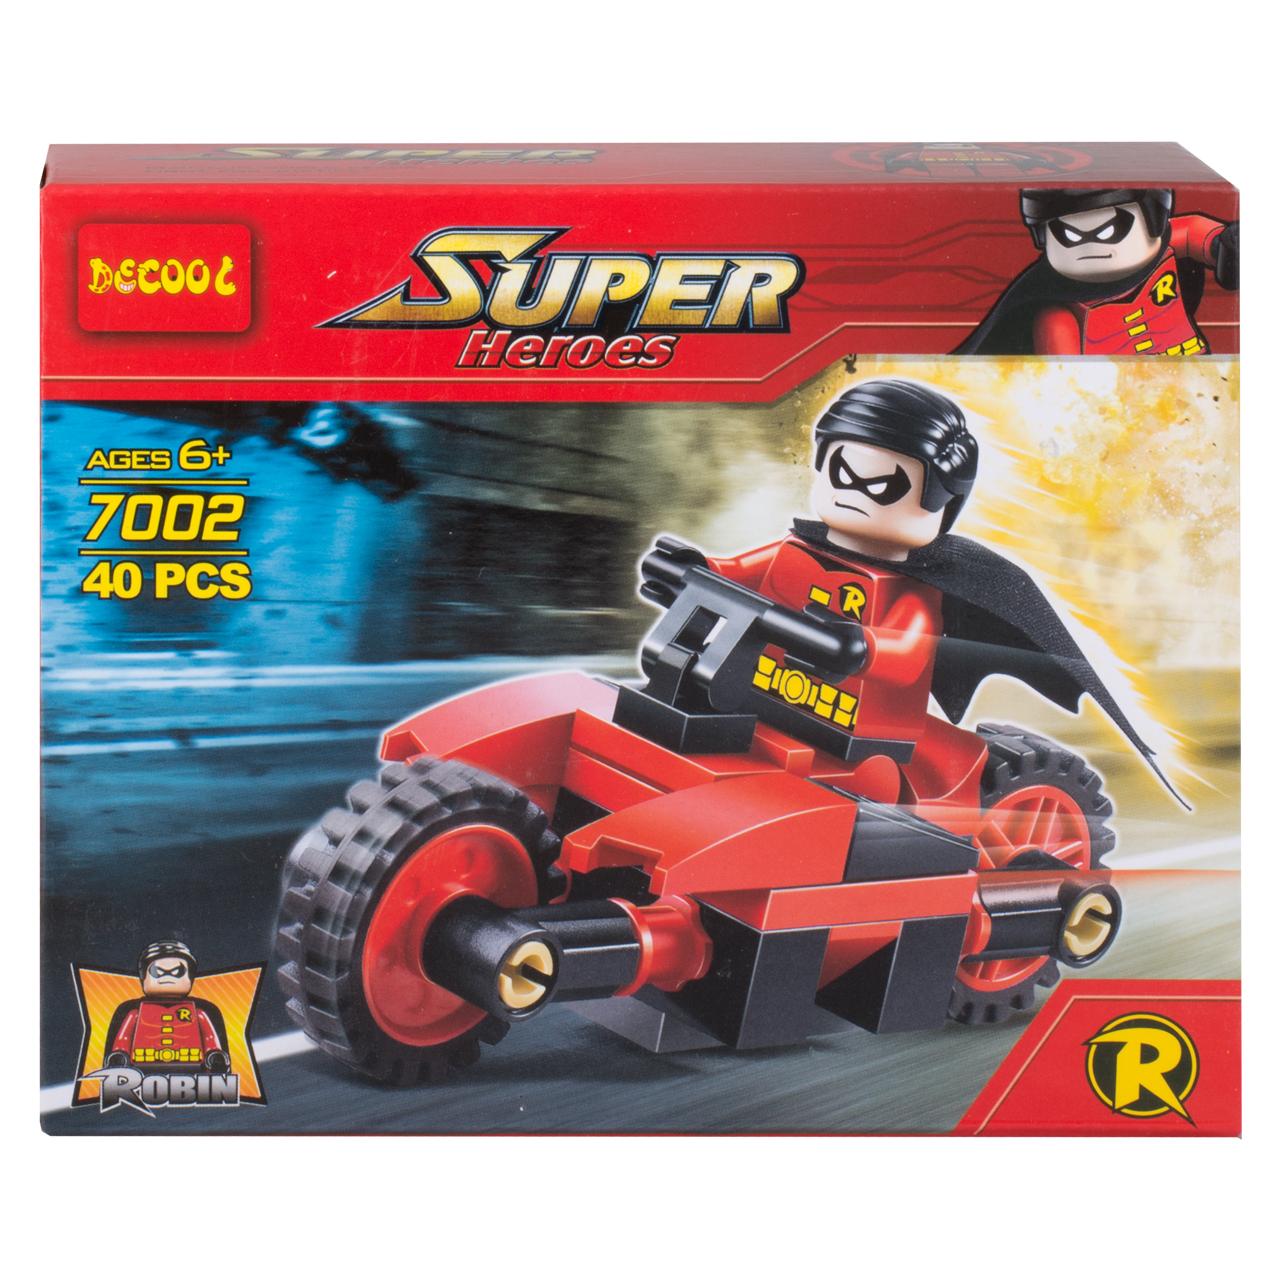 ساختنی دکول مدل Super heros کد 7002